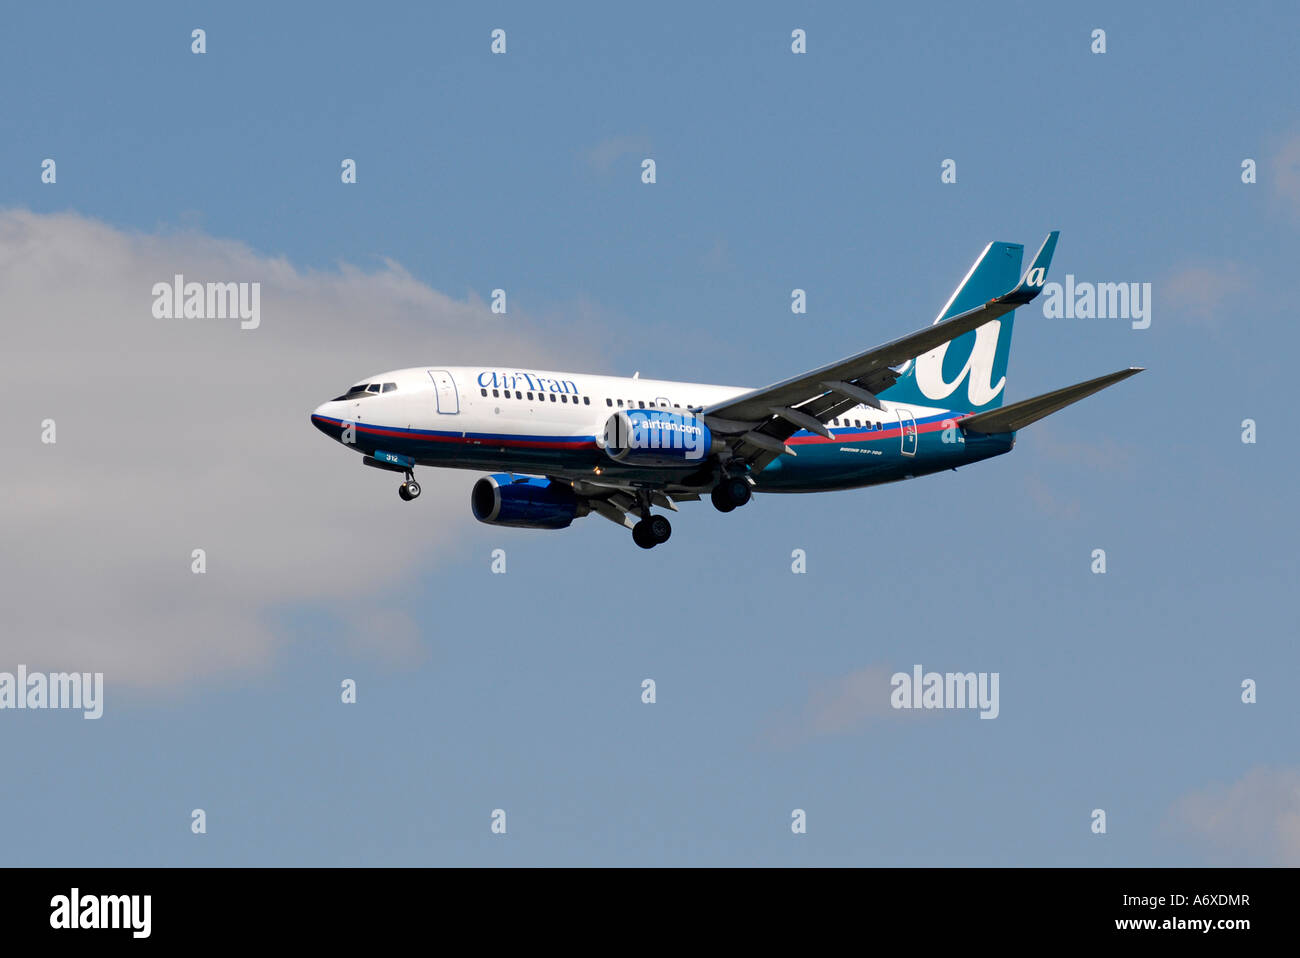 Air Trans Jet airliner aircraft prepare to land at Sarasota